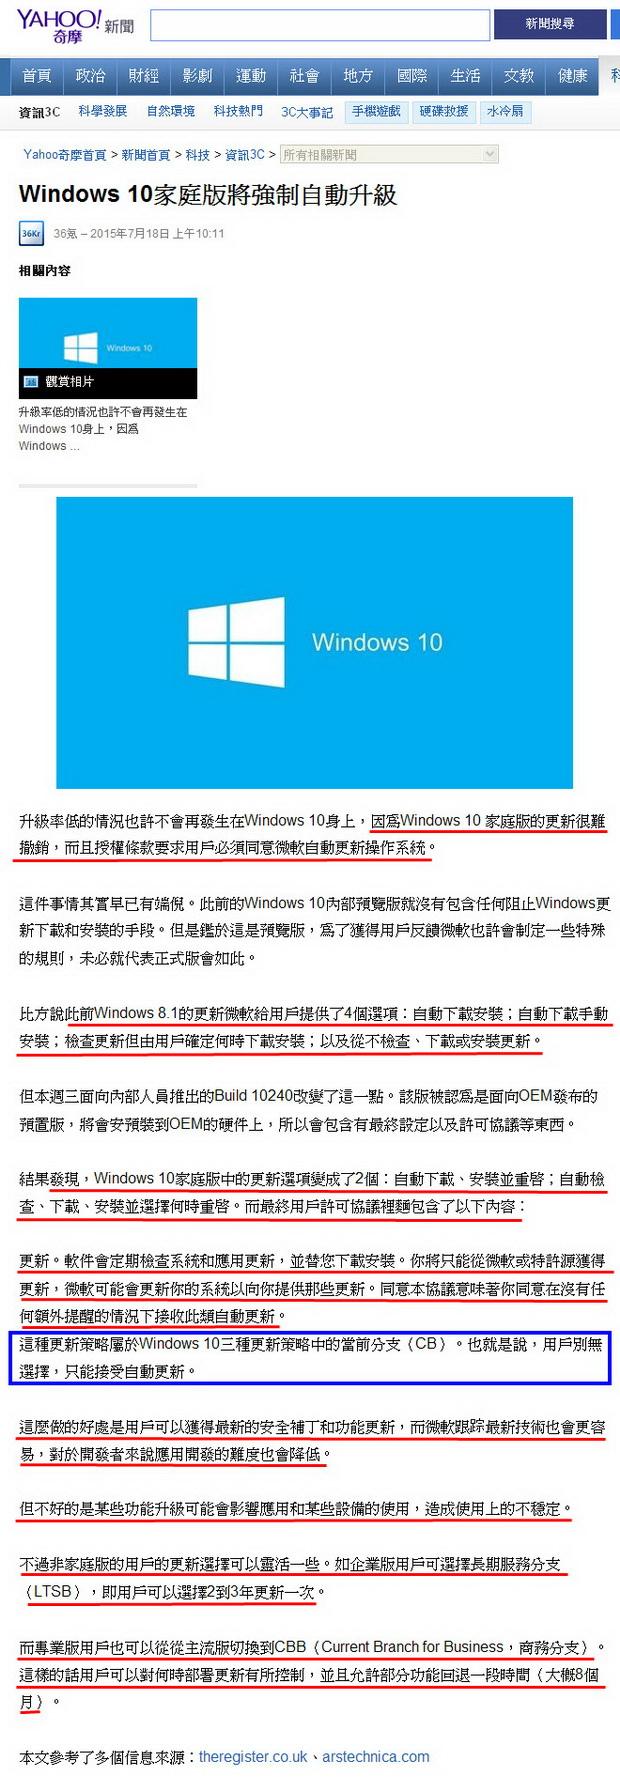 Windows 10家庭版將強制自動升級-2015.07.18.jpg